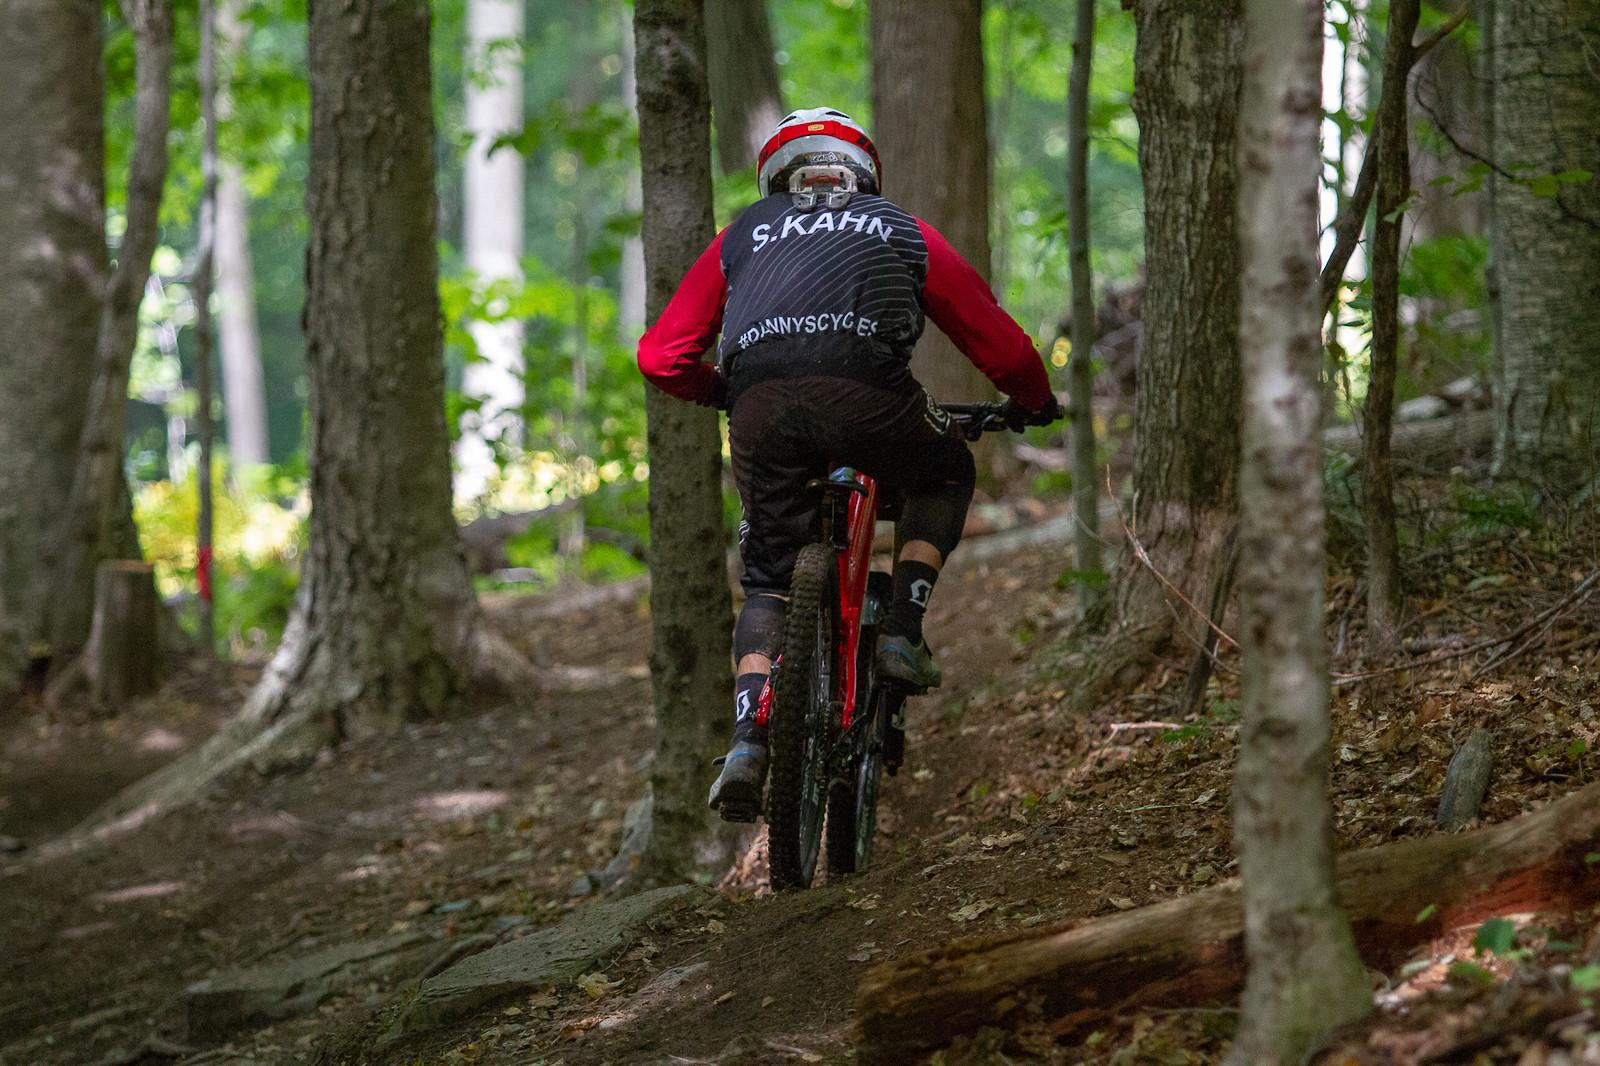 Steve Kahn - JackRice - Mountain Biking Pictures - Vital MTB